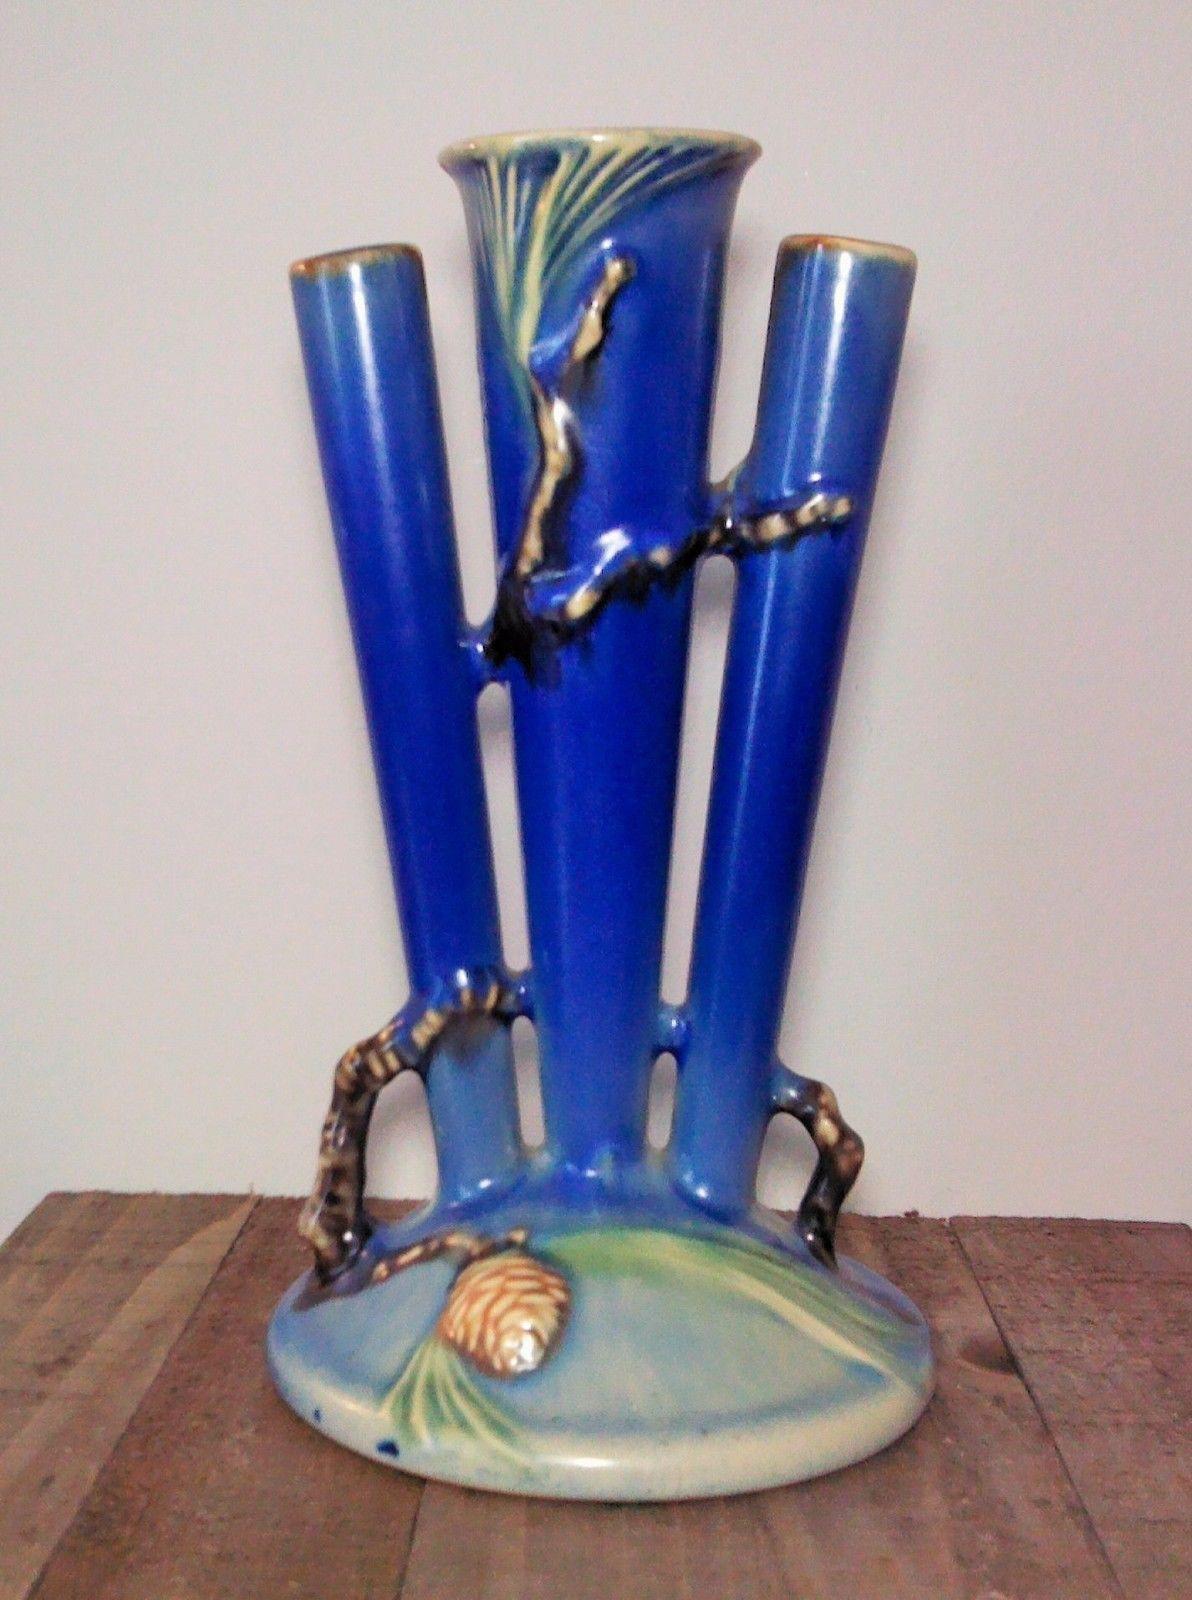 waterford blue vase of blue bud vase stock jar flower 1h vases wedding bud vase centerpiece pertaining to blue bud vase stock rare roseville blue pine cone triple bud vase 113 8 near mint